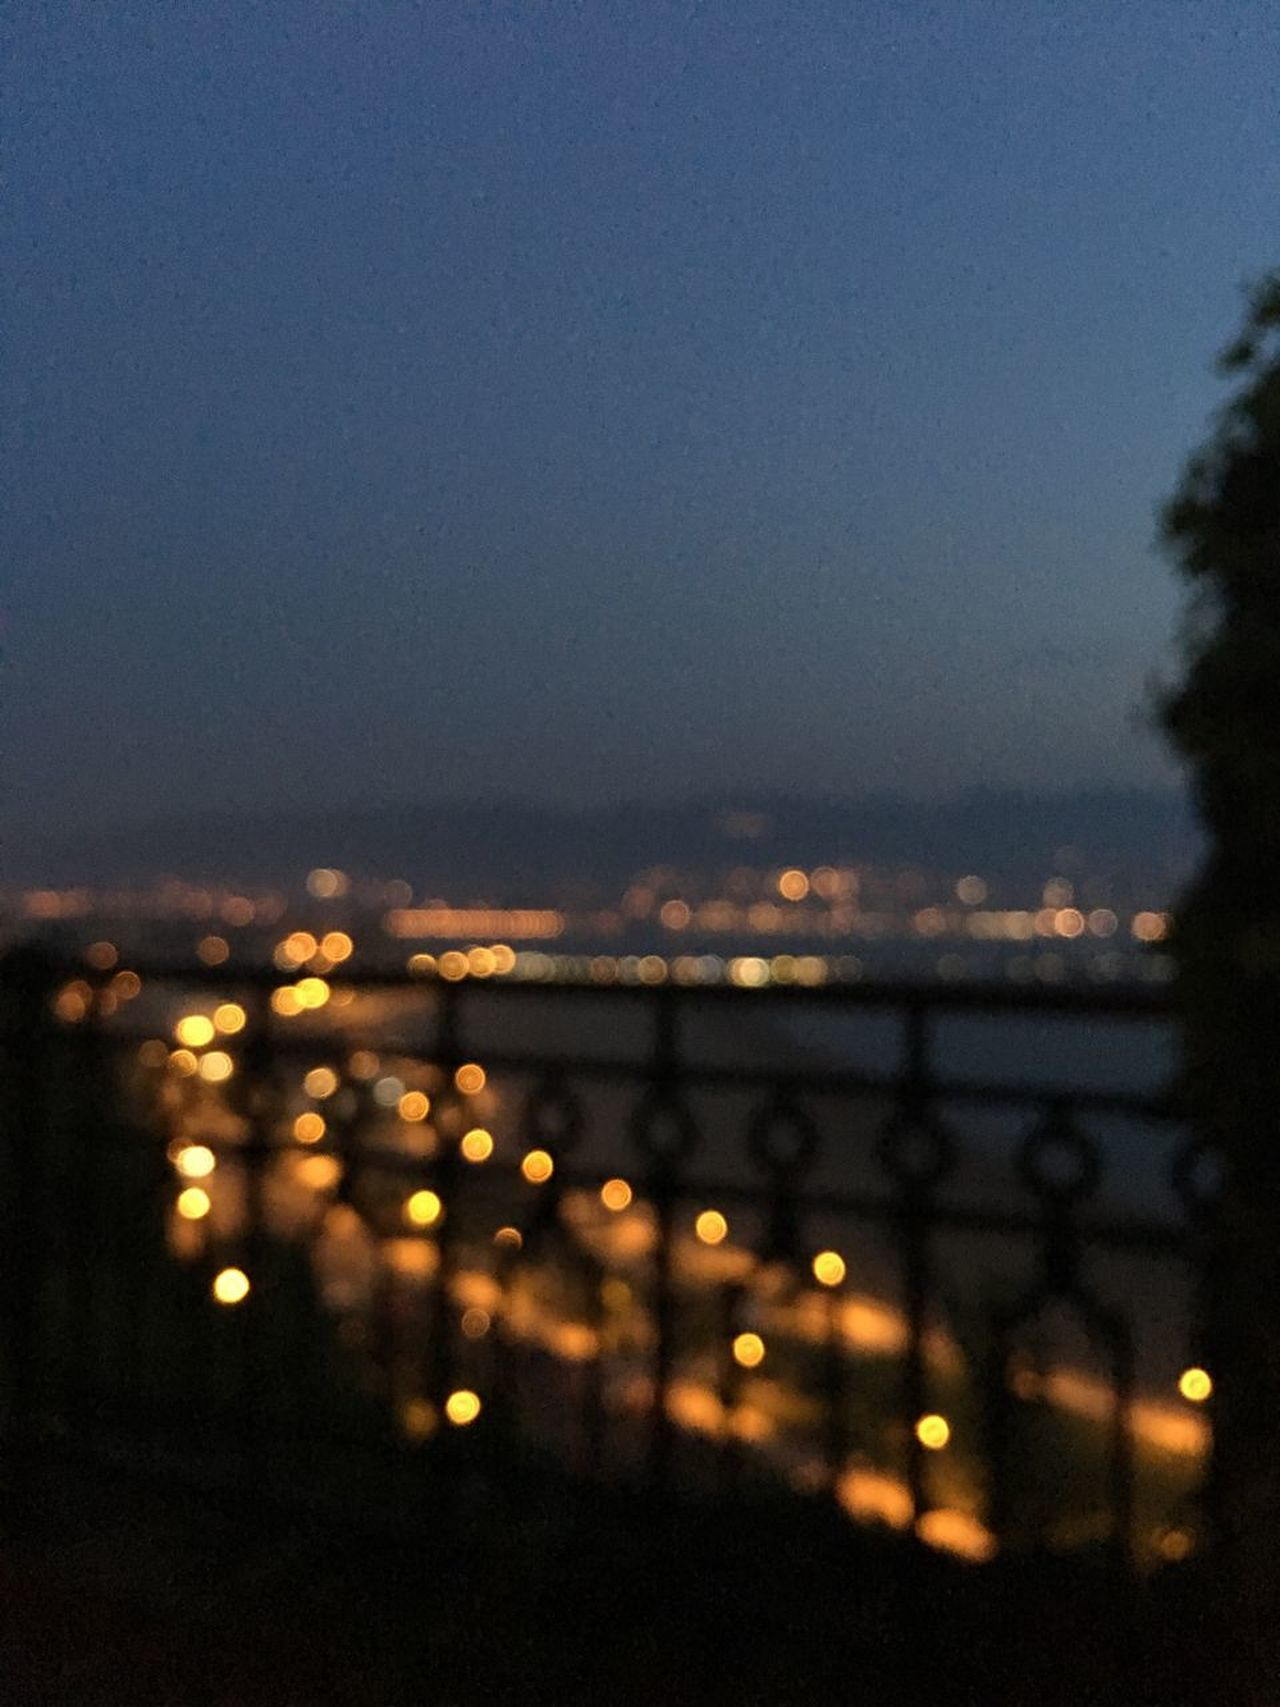 Illuminated Night No People Outdoors City Defocused Sky Architecture Water Cityscape Nature Bokeh First Eyeem Photo EyeEmNewHere EyeEmNewHere